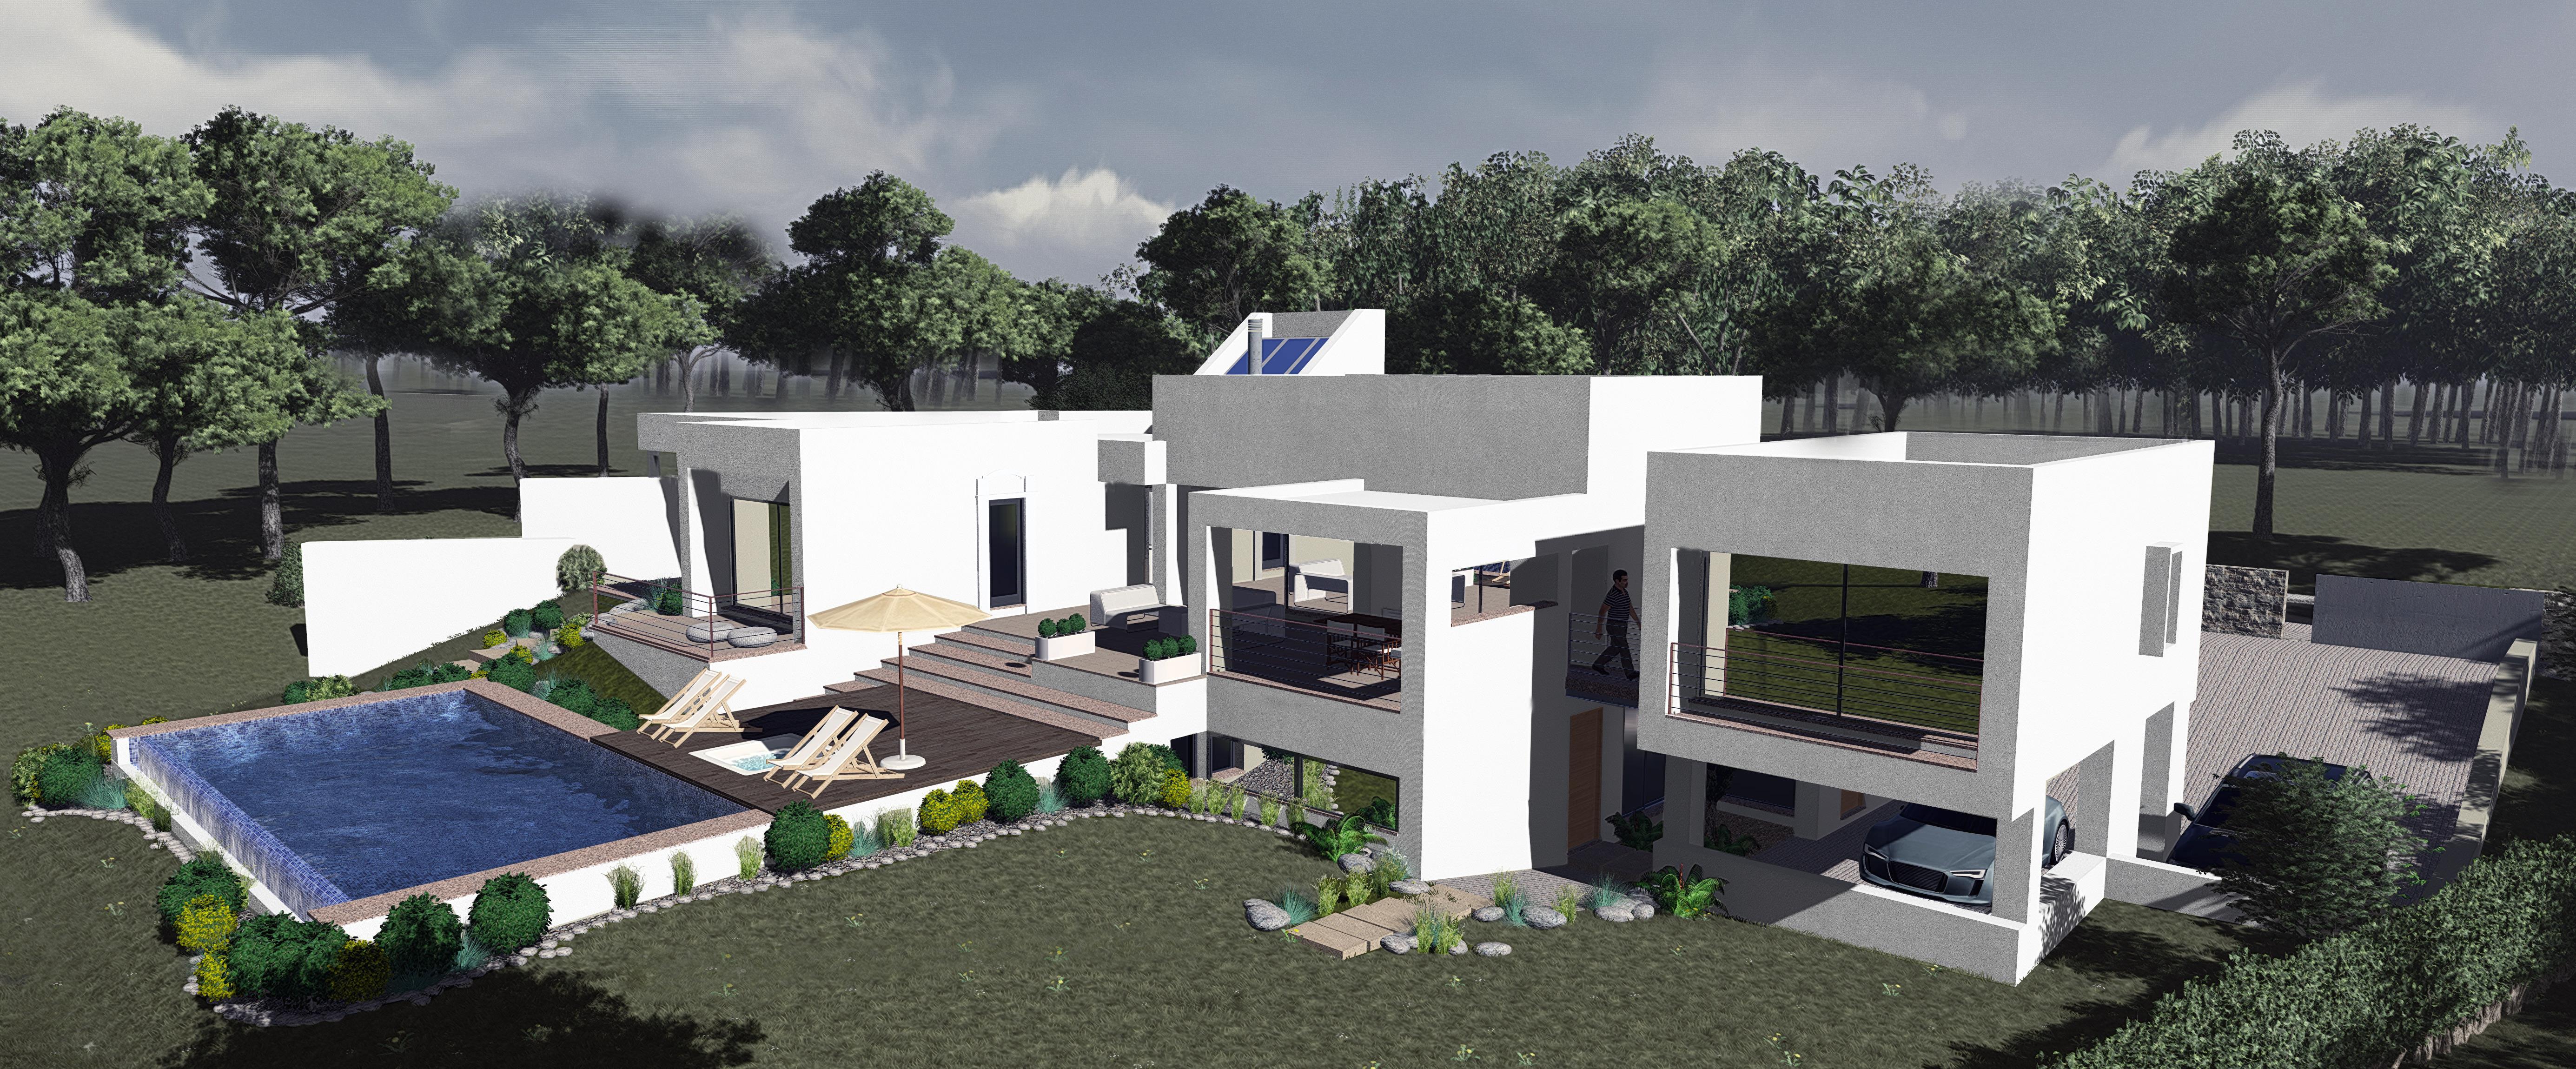 独户住宅 为 销售 在 House, 3 bedrooms, for Sale Loule, 阿尔加维, 葡萄牙